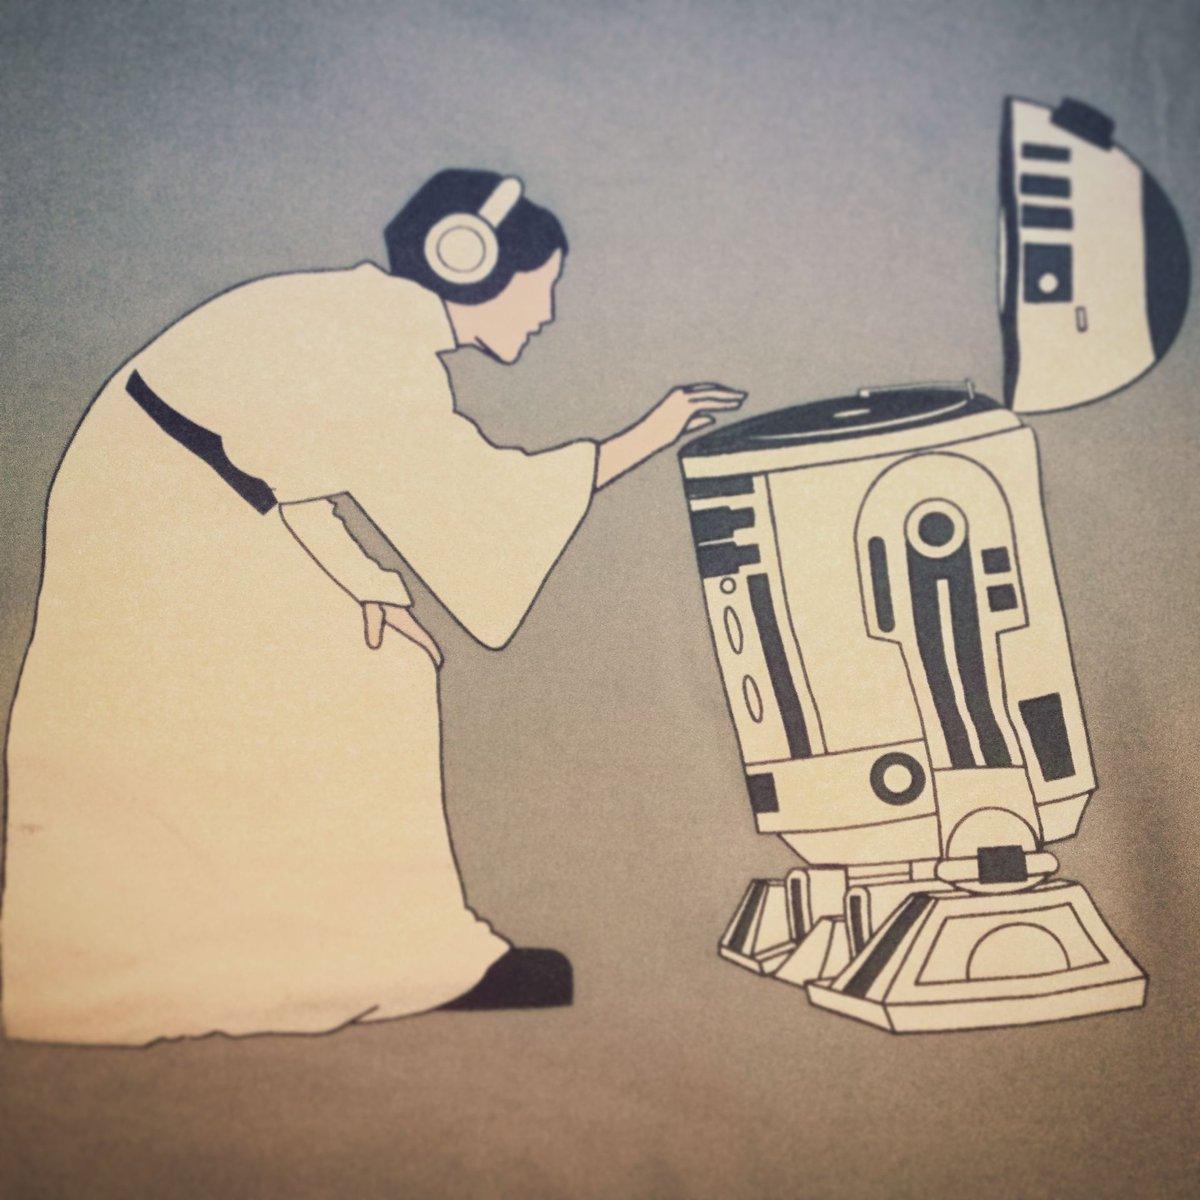 Le mix du dimanche soir... #StarWars #Tshirt #princessleia #R2D2 #dj #OOTD #Music<br>http://pic.twitter.com/nt1F5EJEvK